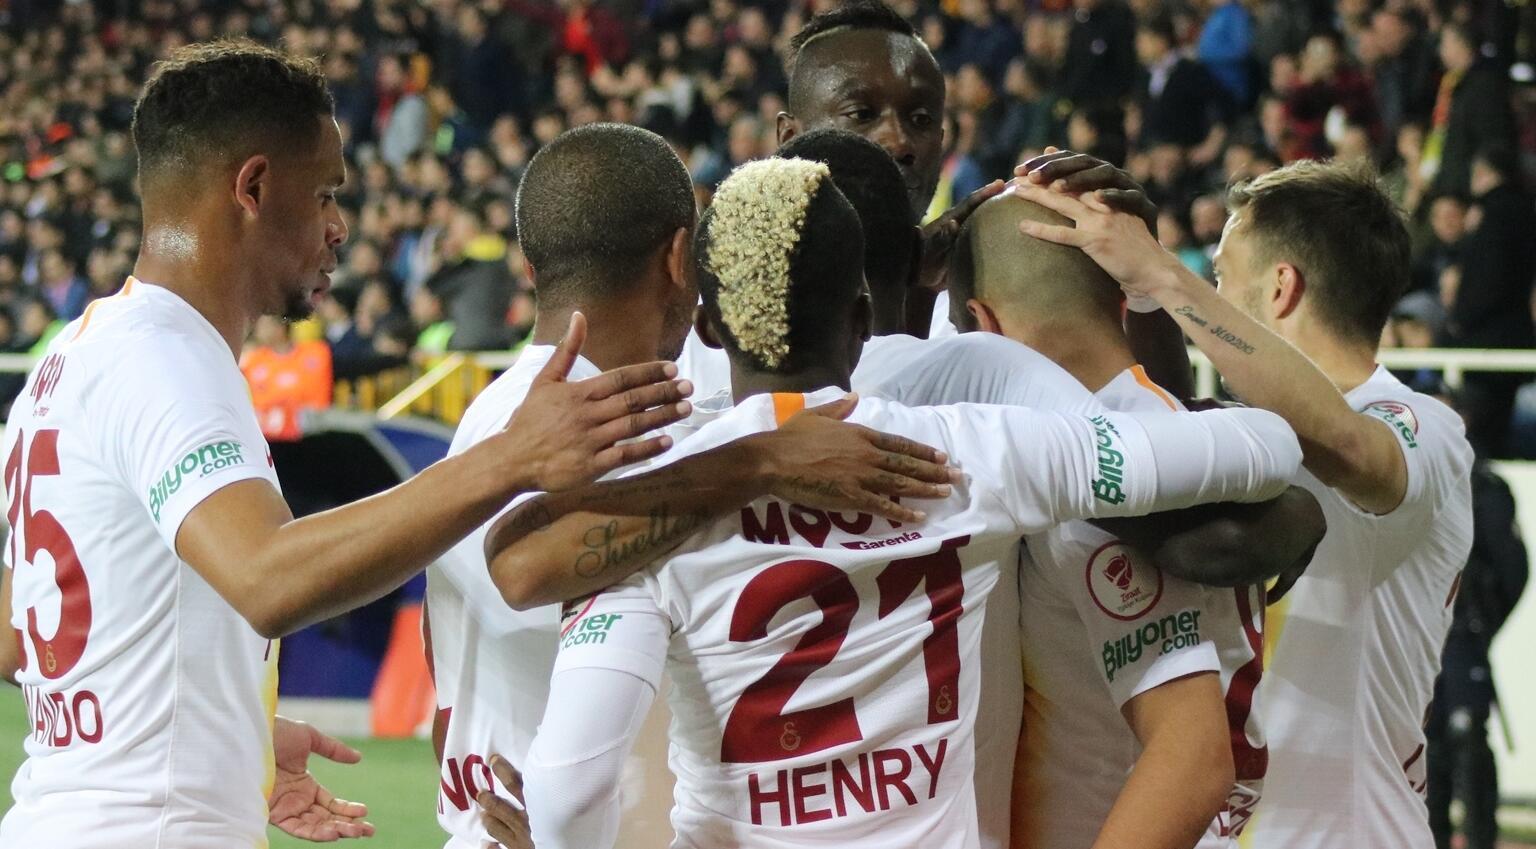 Yeni Malatyaspor 2-5 Galatasaray